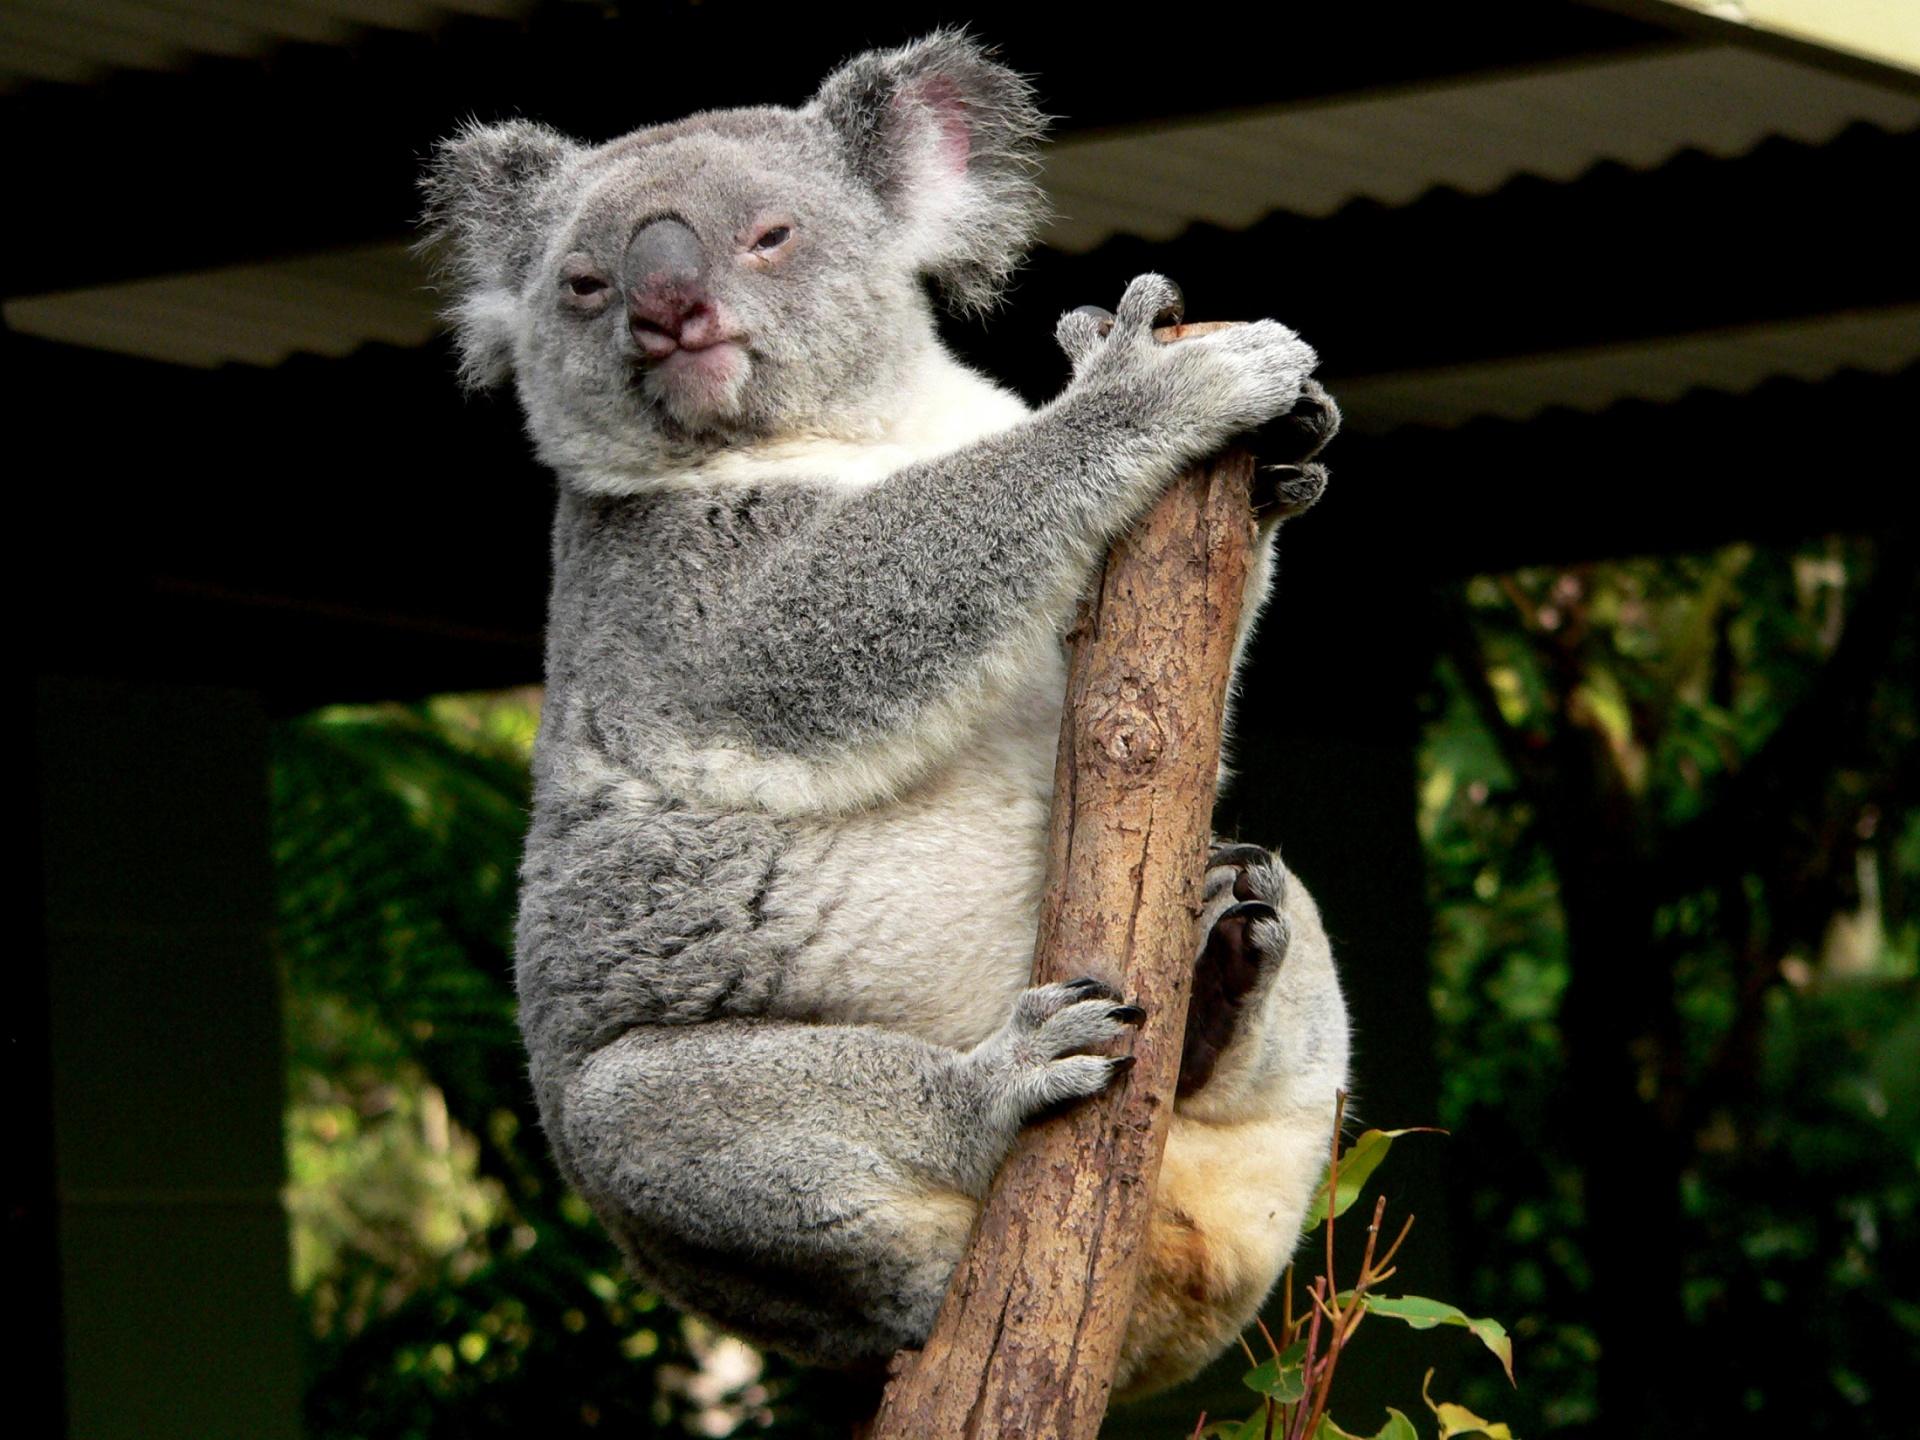 Cute Digital Wallpaper Koala Bear Free Stock Photo Public Domain Pictures